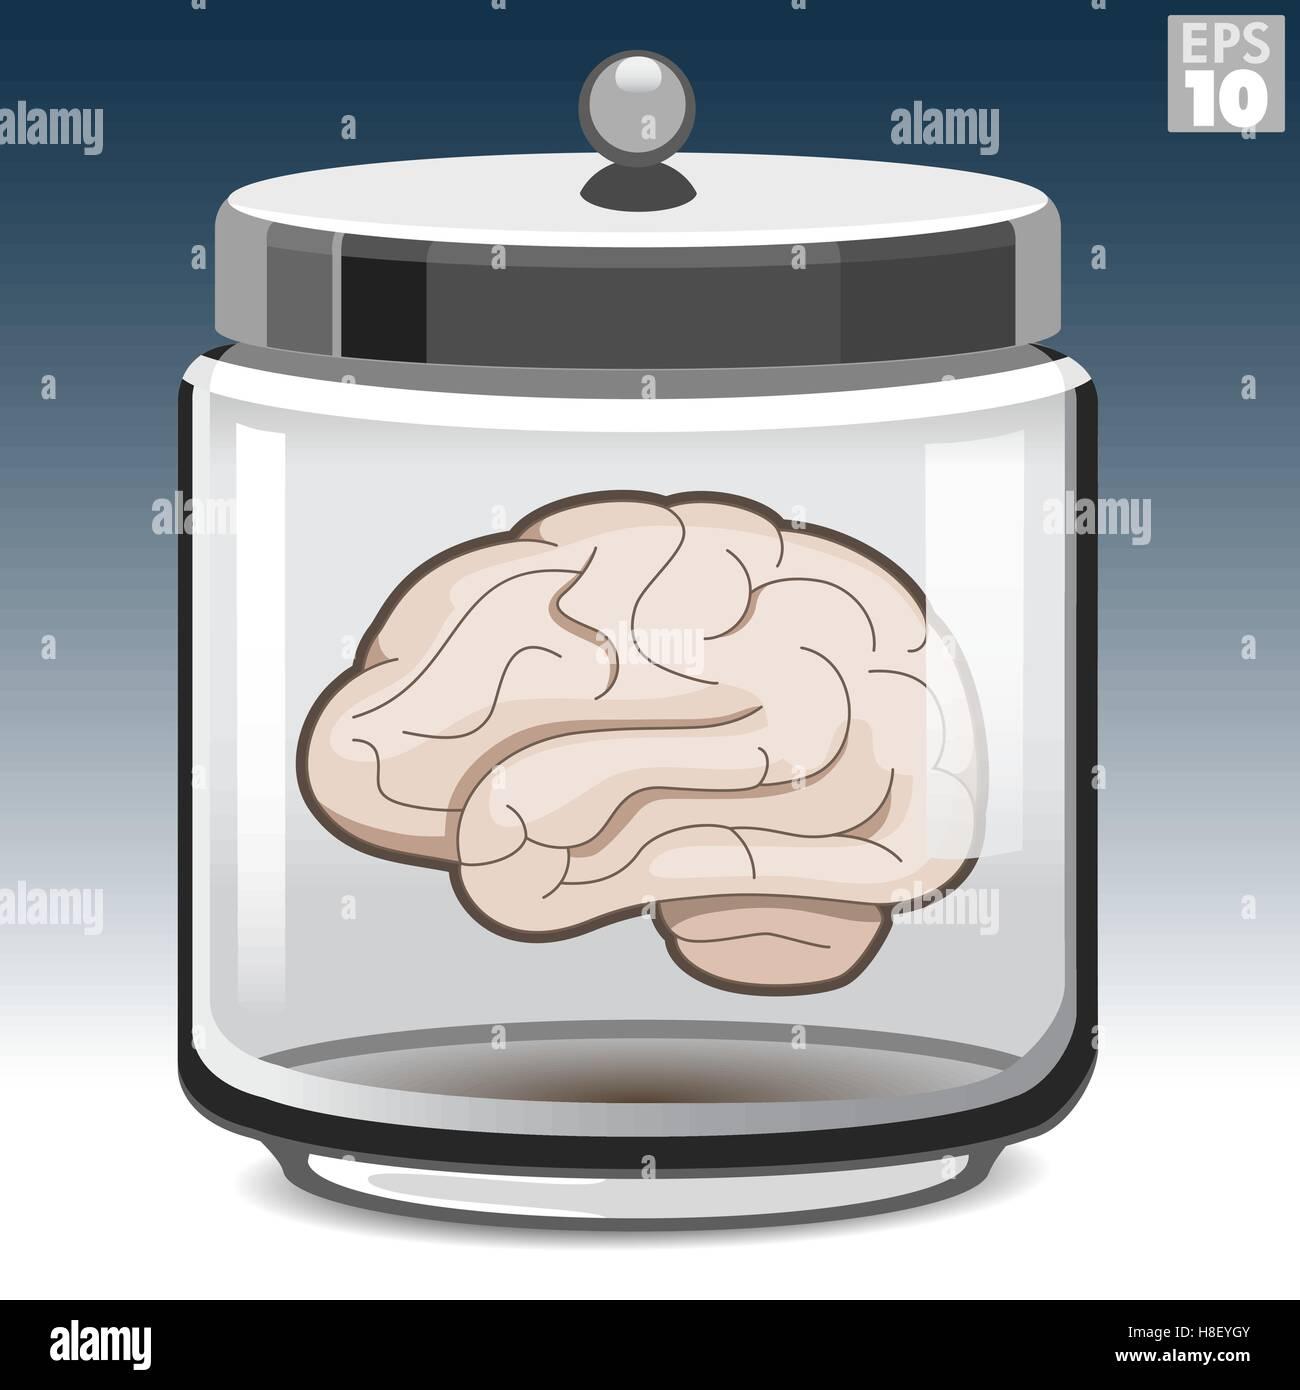 Cerebro Humano en un frasco de vidrio Imagen De Stock